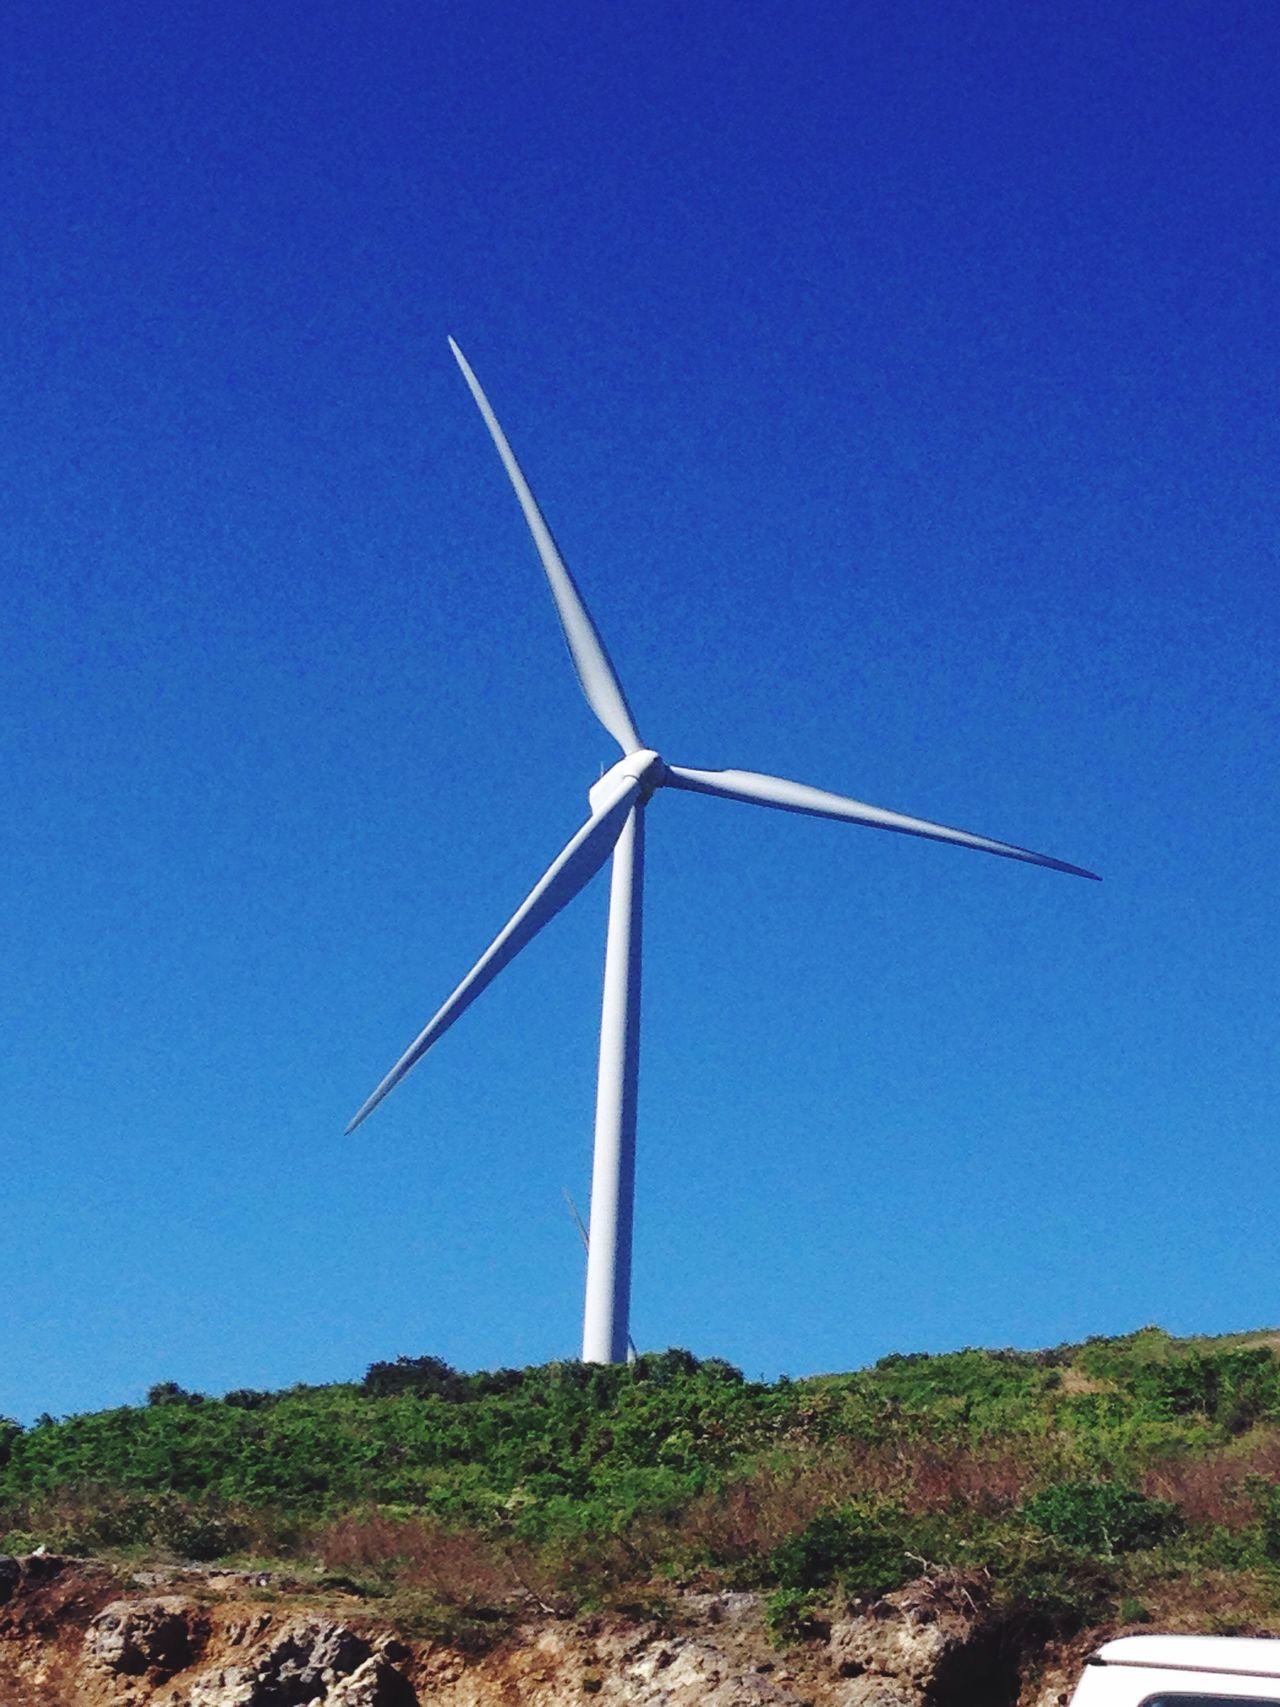 Ilocos Norte, Philippines  Windmill